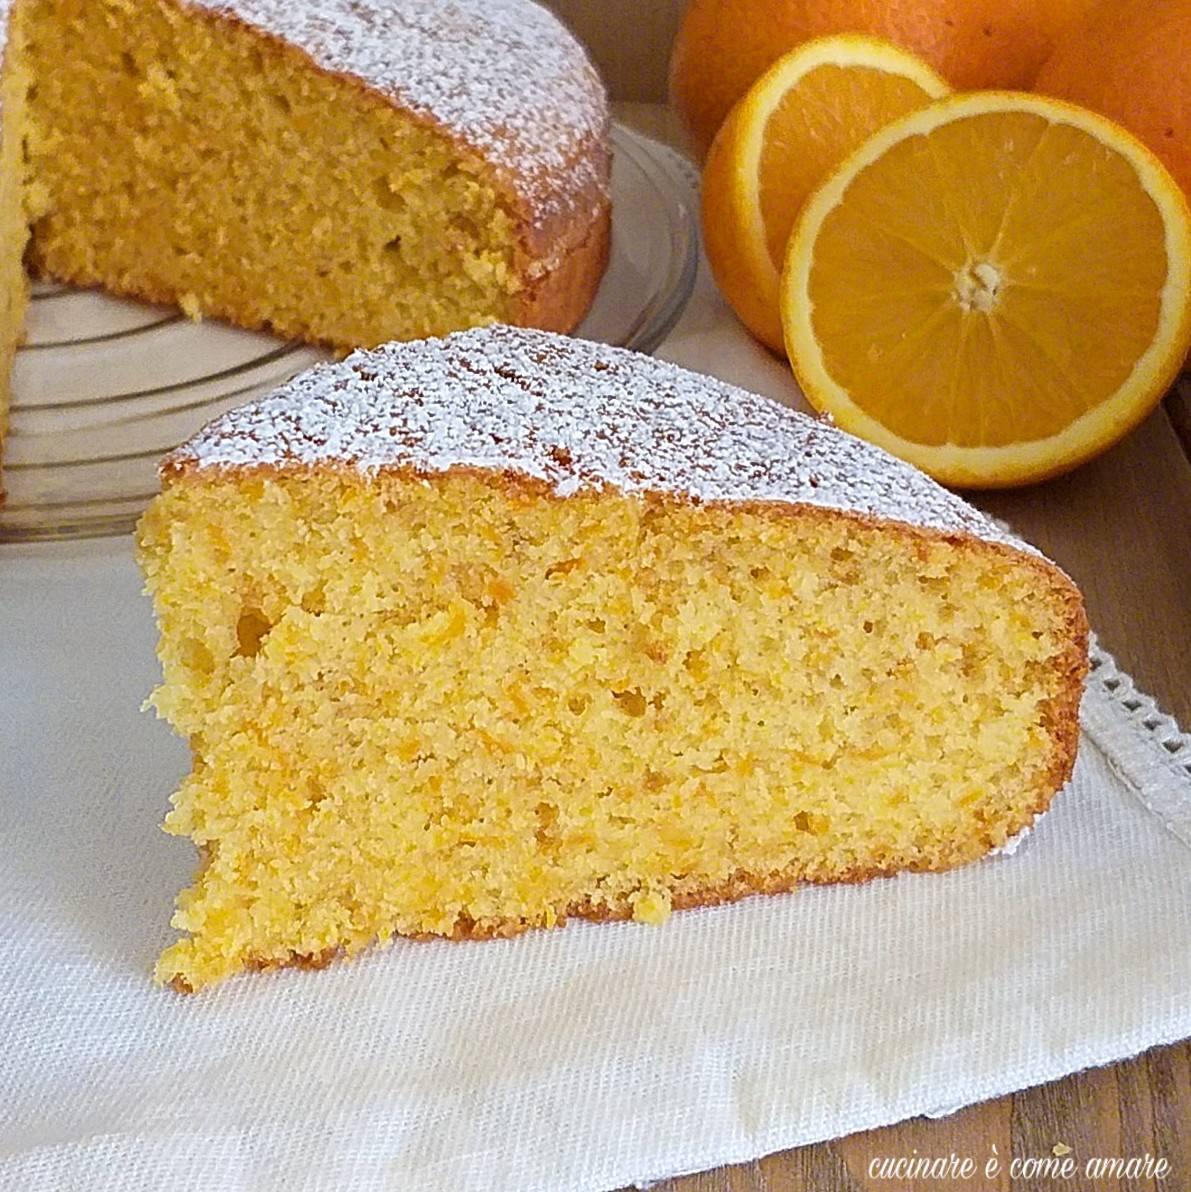 torta facilissima all'arancia dolce soffice